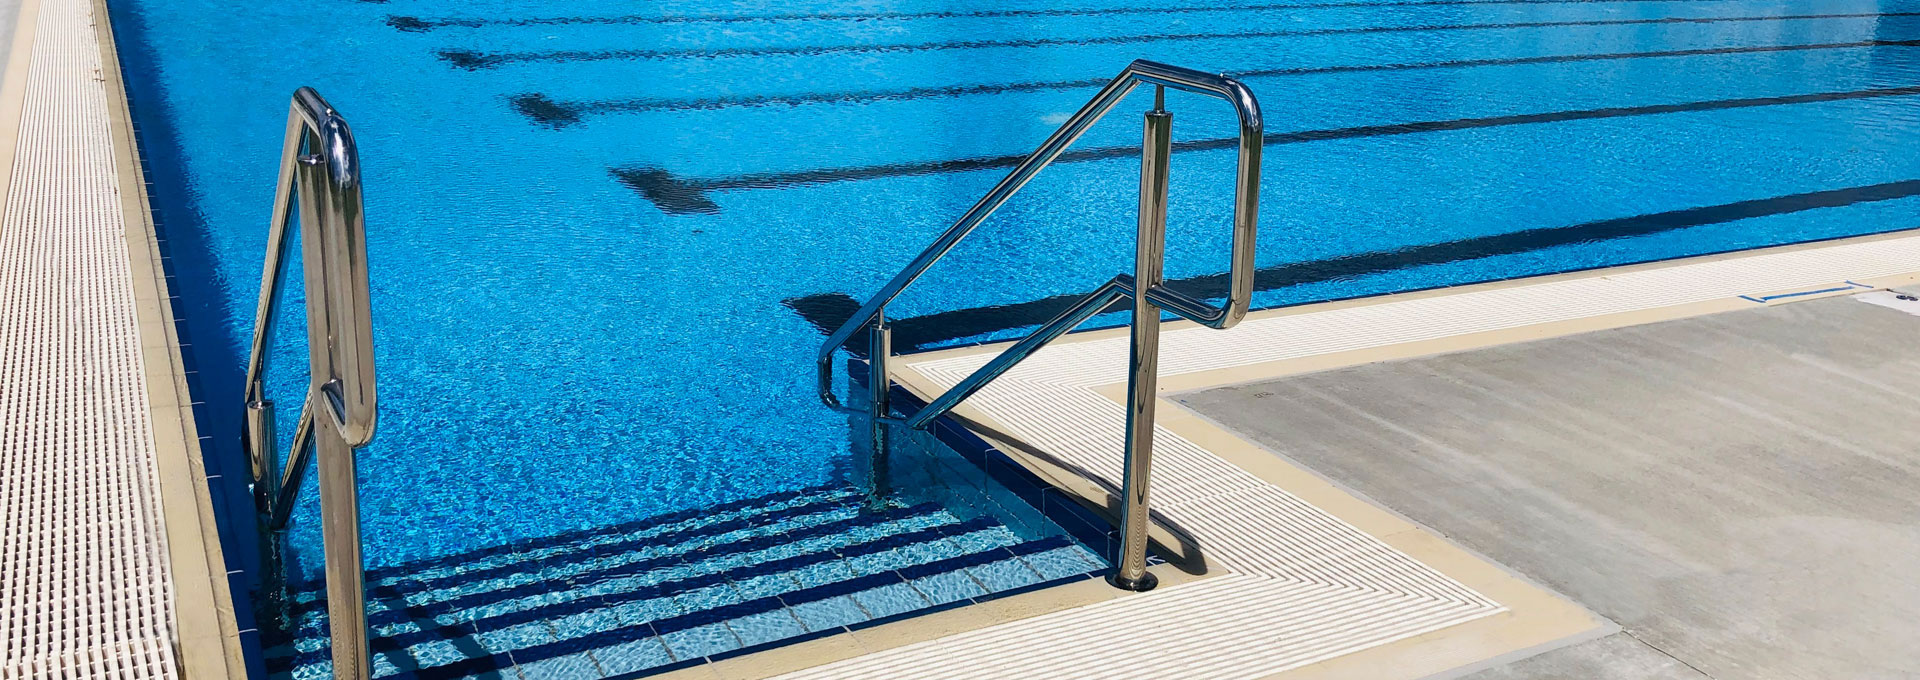 horsham outdoor pool redevelopment